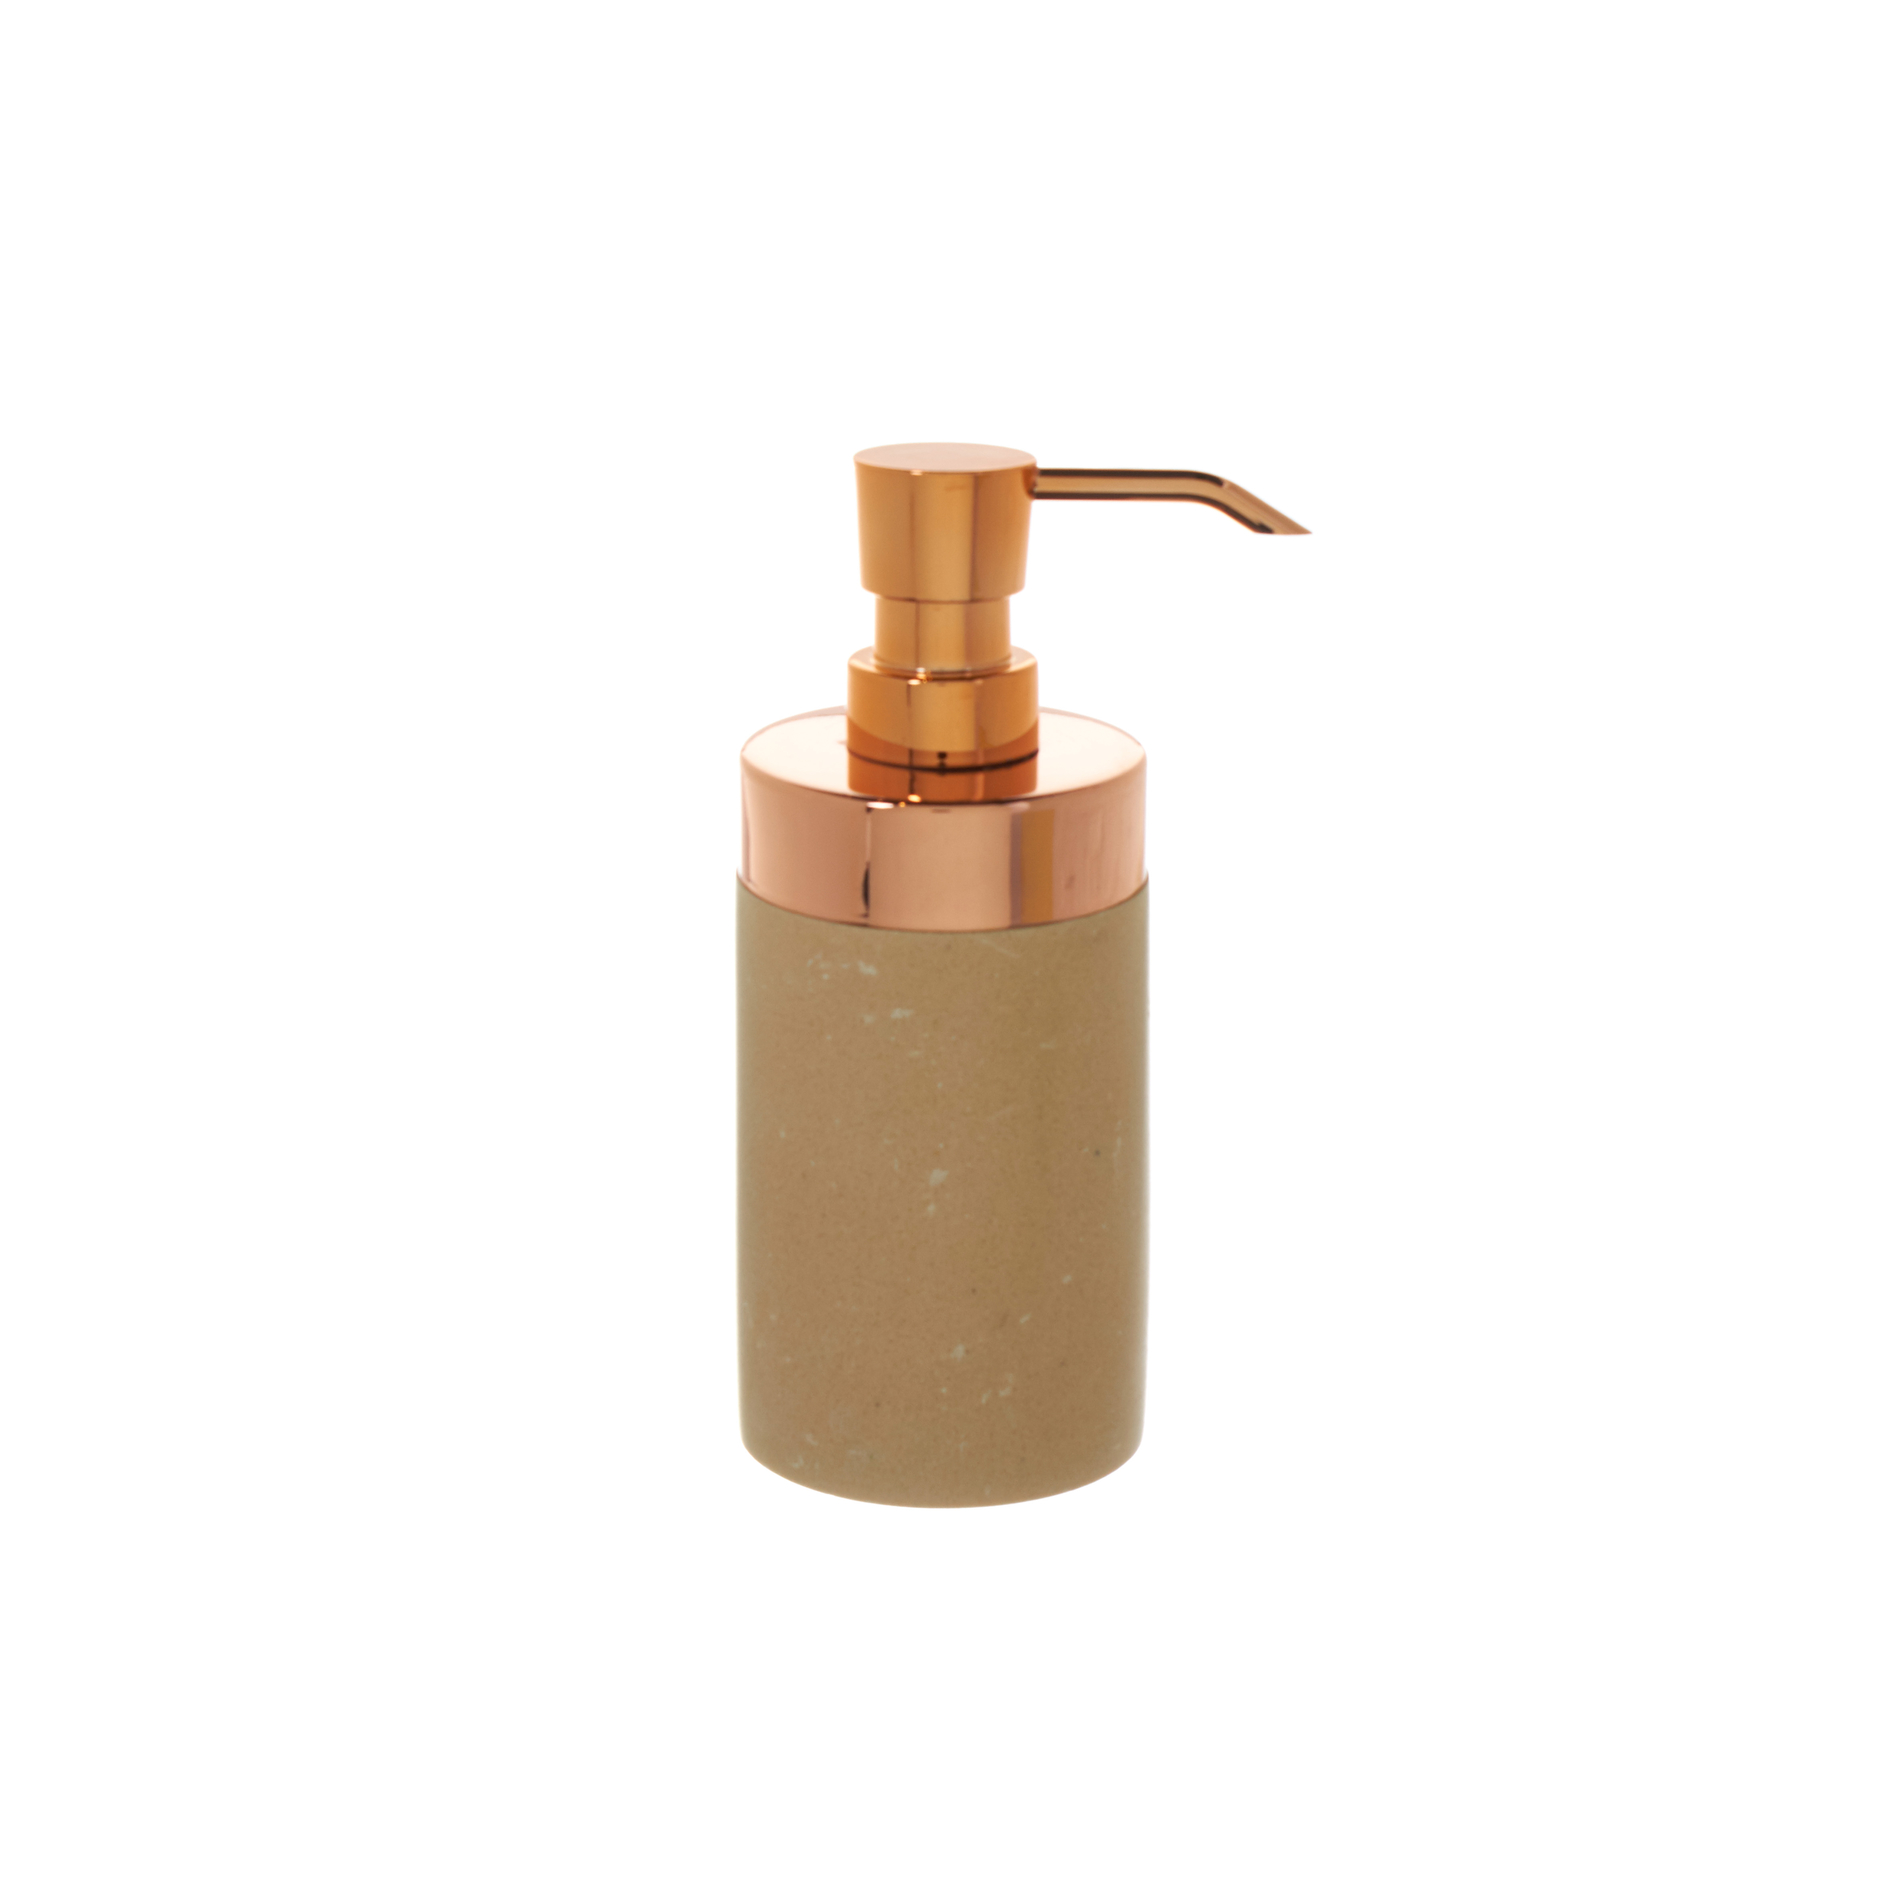 Captivating Copper Coloured Bathroom Accessories